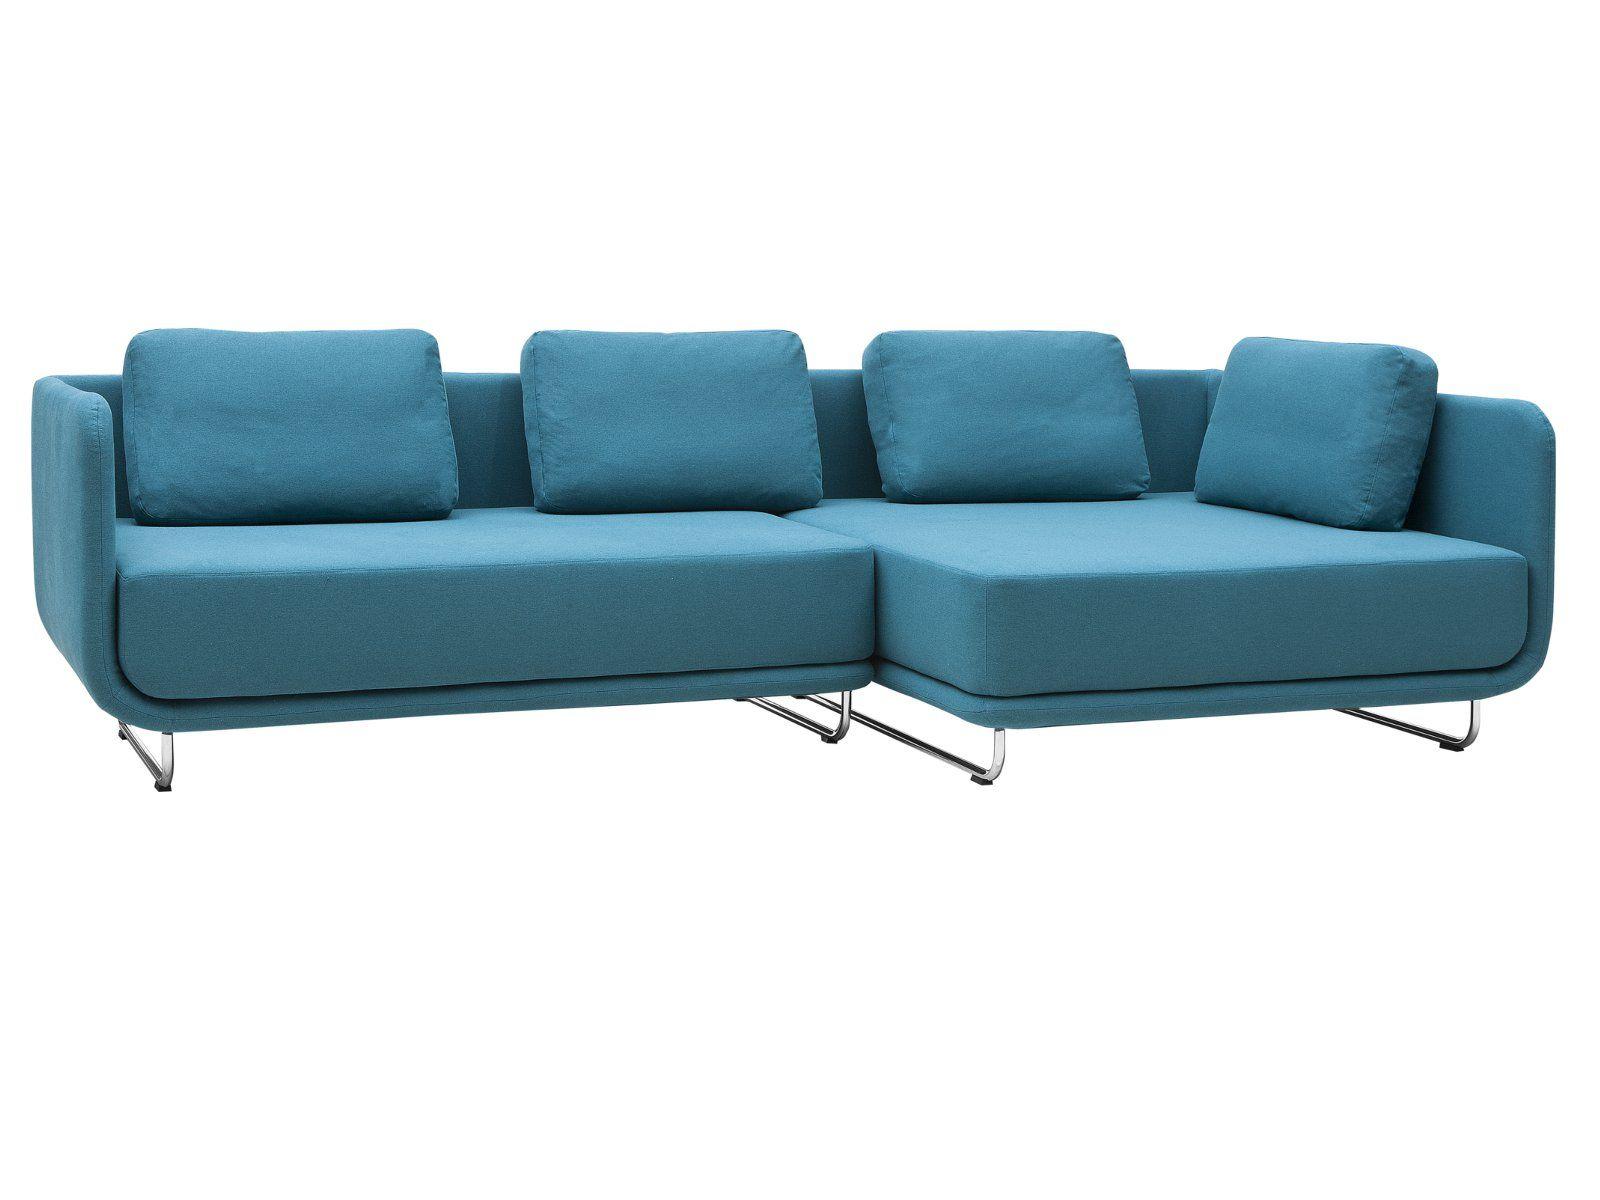 canap composable setup by softline design matthias demacker. Black Bedroom Furniture Sets. Home Design Ideas